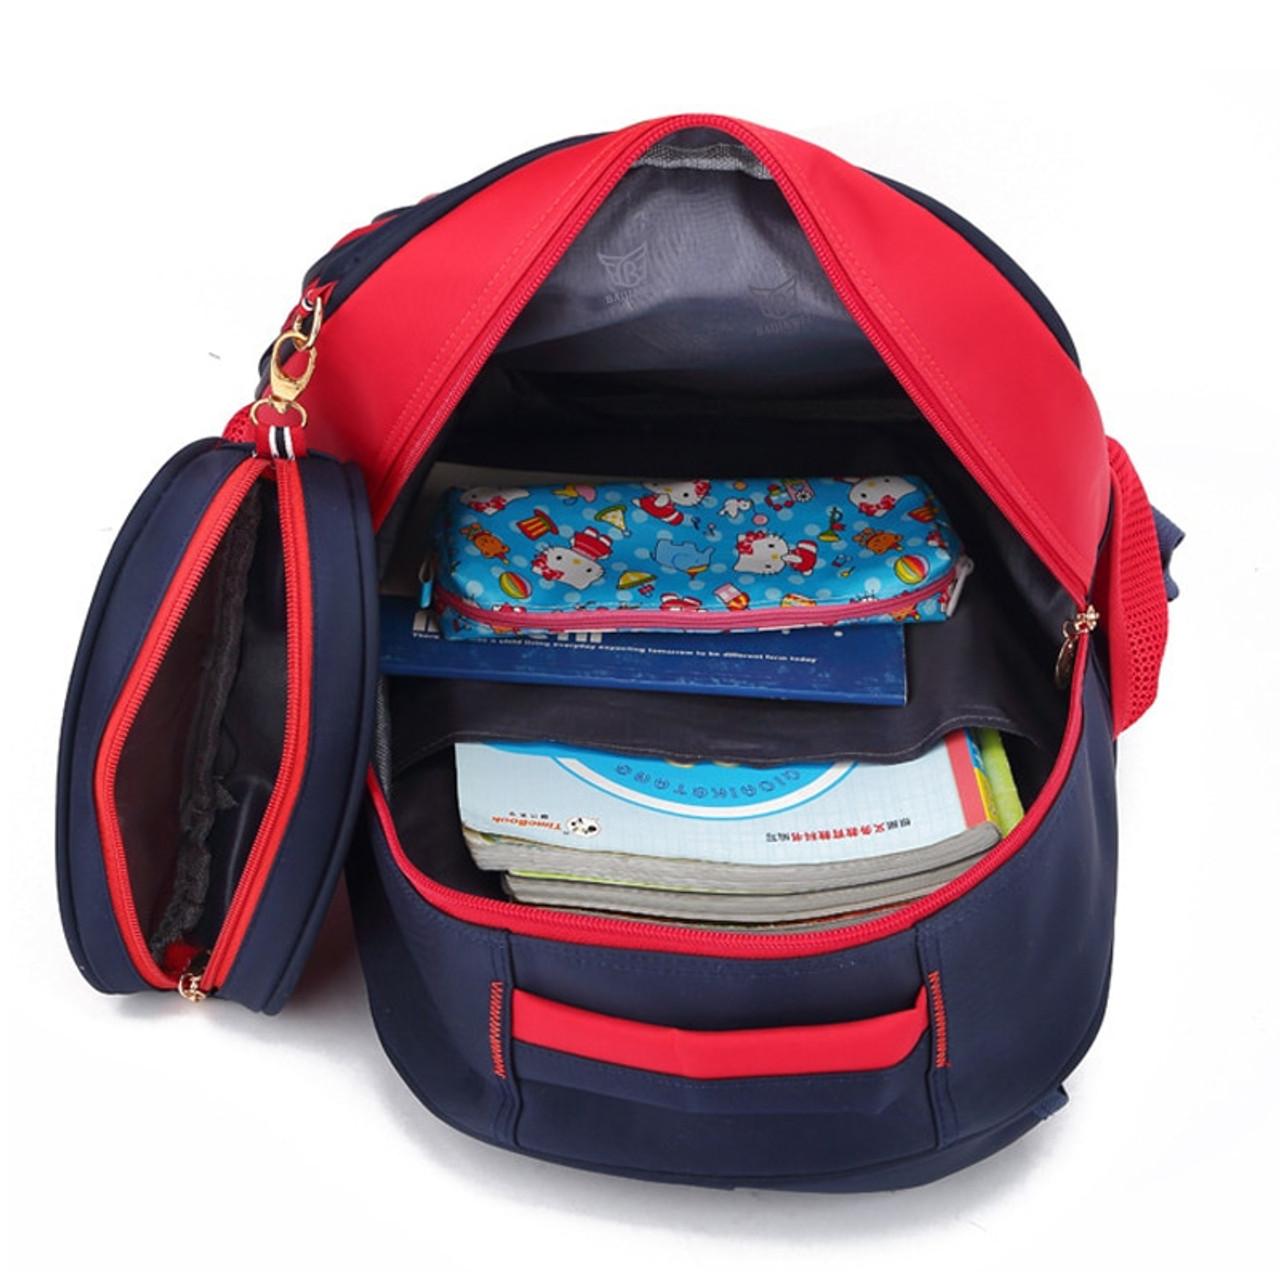 adf03ed4139f BAIJIAWEI Hot Sale School Bags For Children Kids Fashion Backpack Primary  School Bag for Boys Girls Waterproof Schoolbags